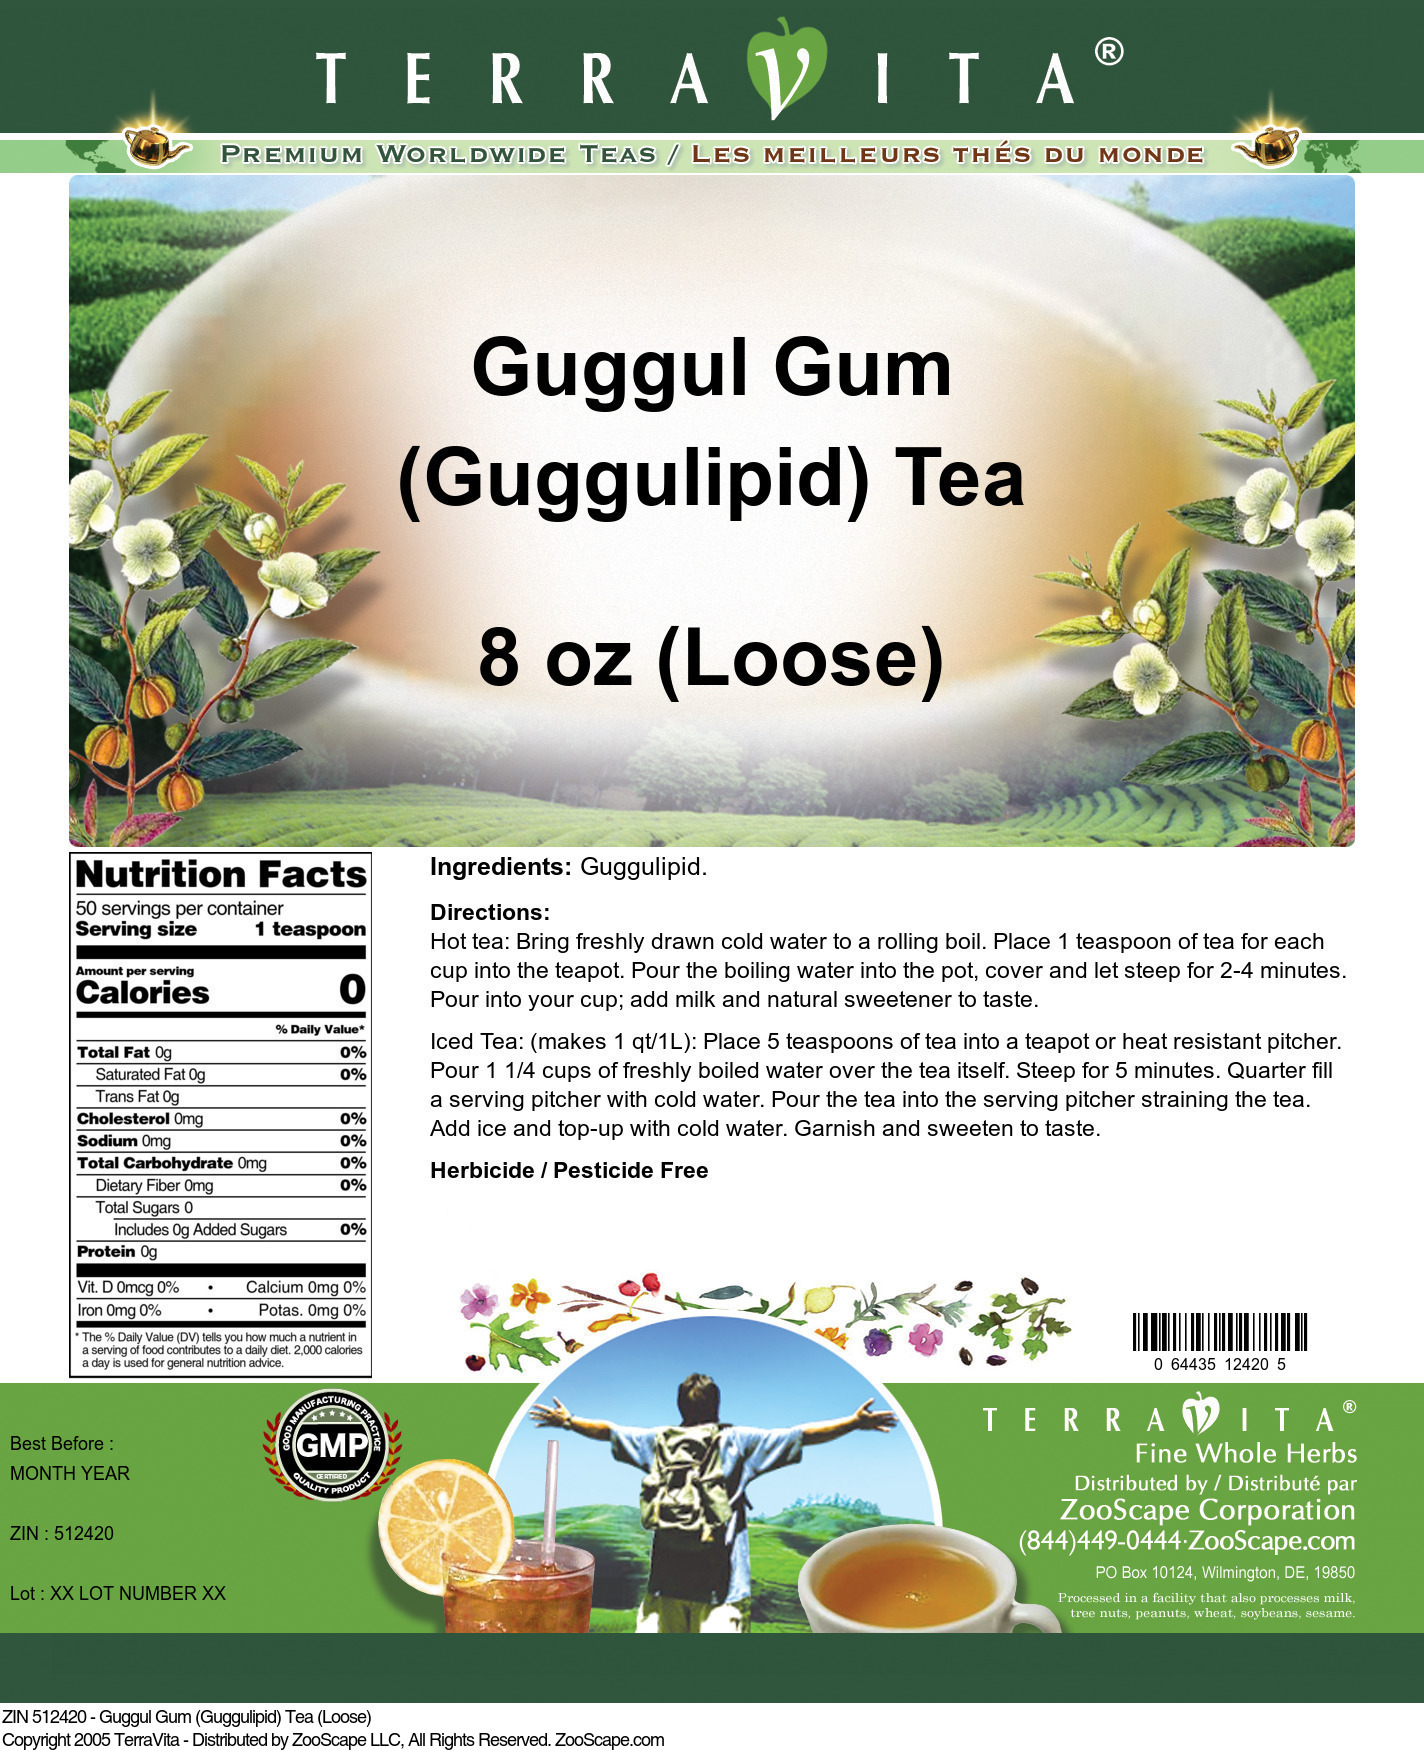 Guggul Gum (Guggulipid) Tea (Loose)